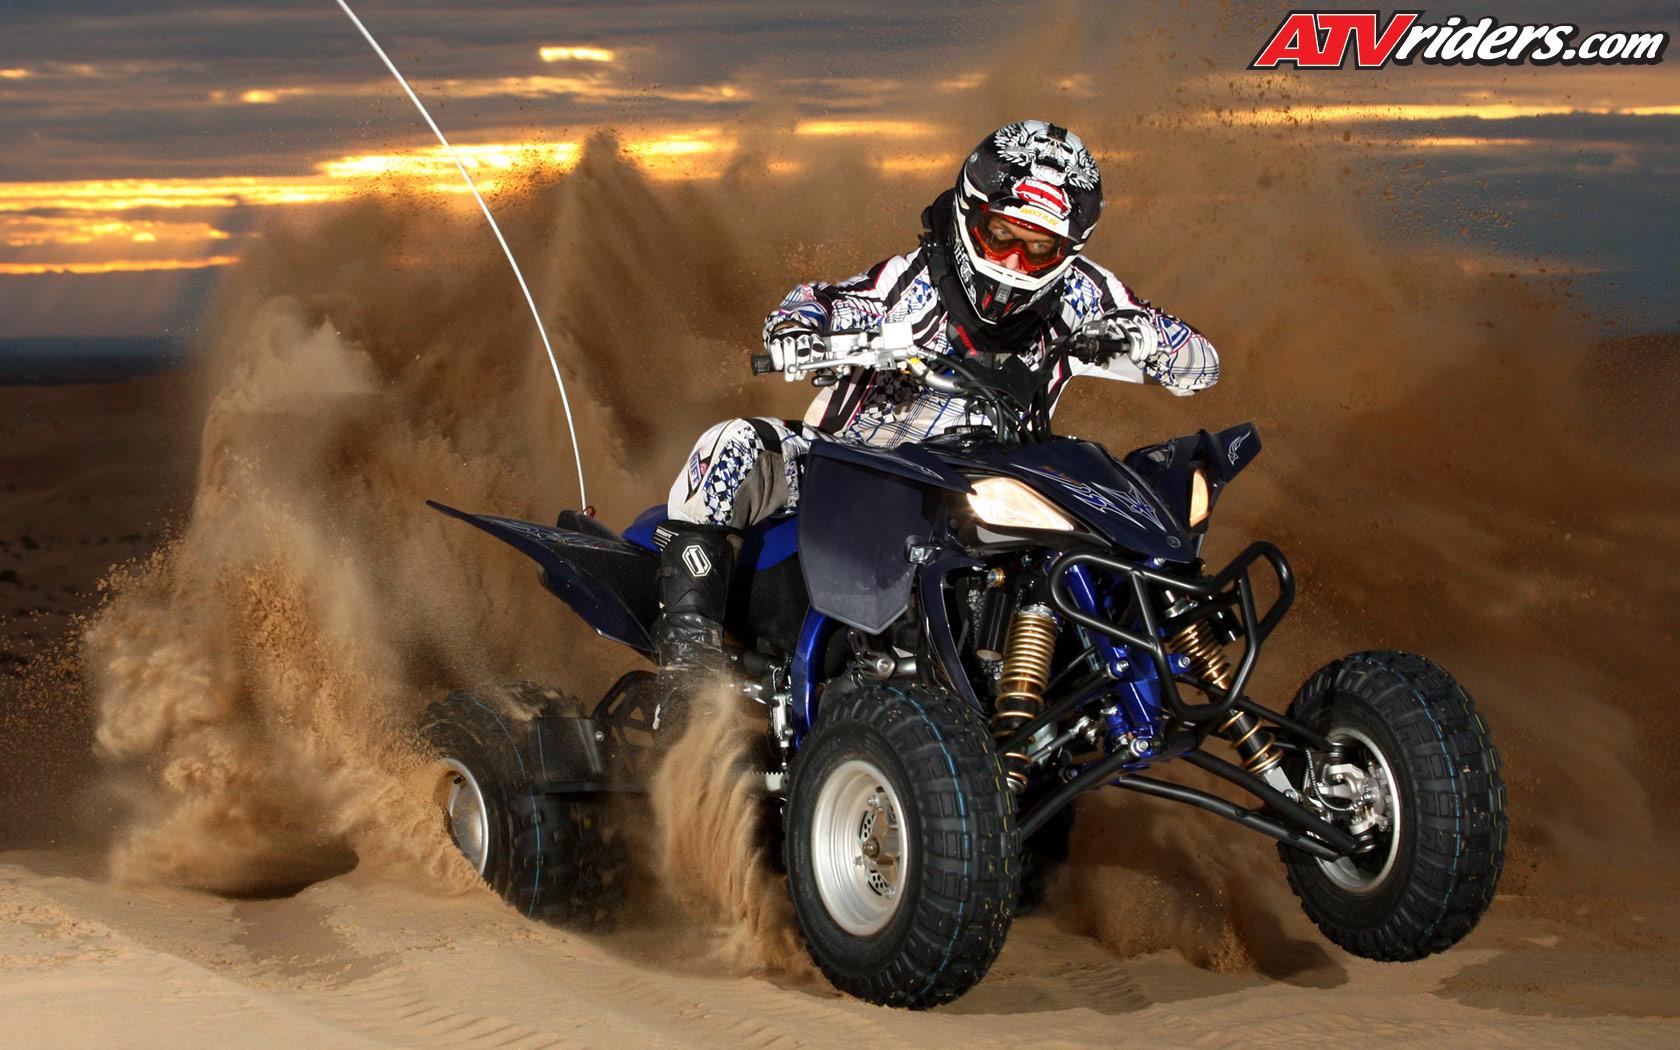 Yamaha yfzr special edition atv glamis wednesday wp content uploads html yamaha atv wallpapers 16 html 1050 1680 x